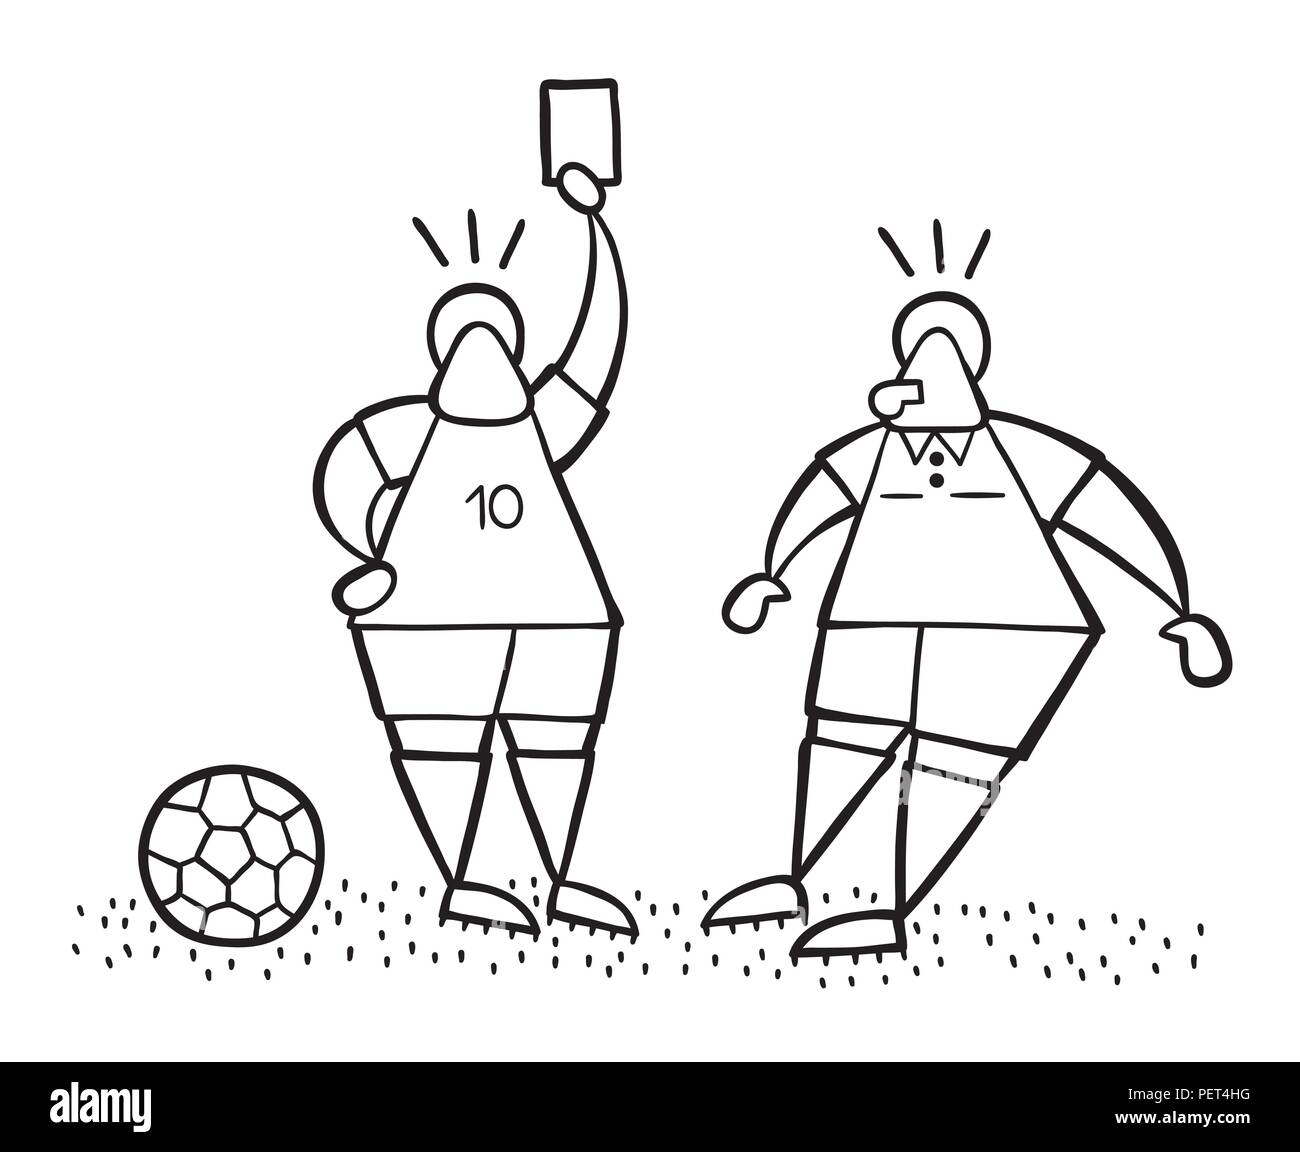 Vector Illustration Comic Fussball Spieler Mann Zeigen Rote